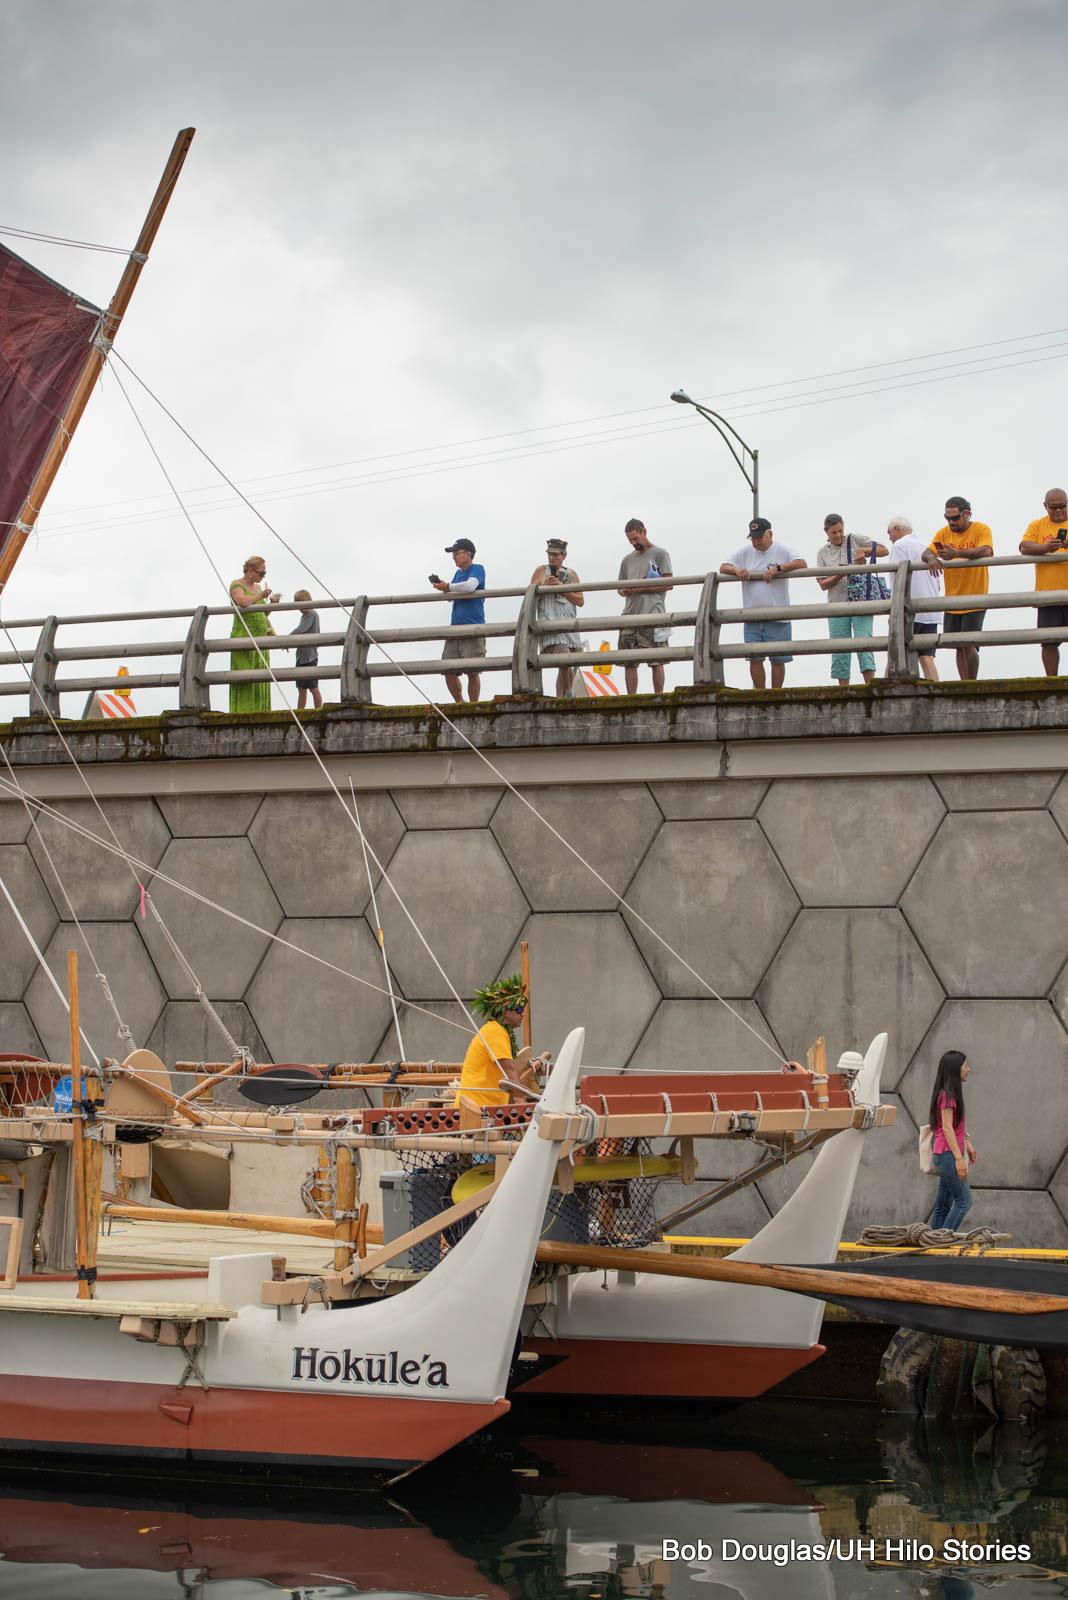 Hokulea docked near bridge, people up on bridge looking down on canoe.